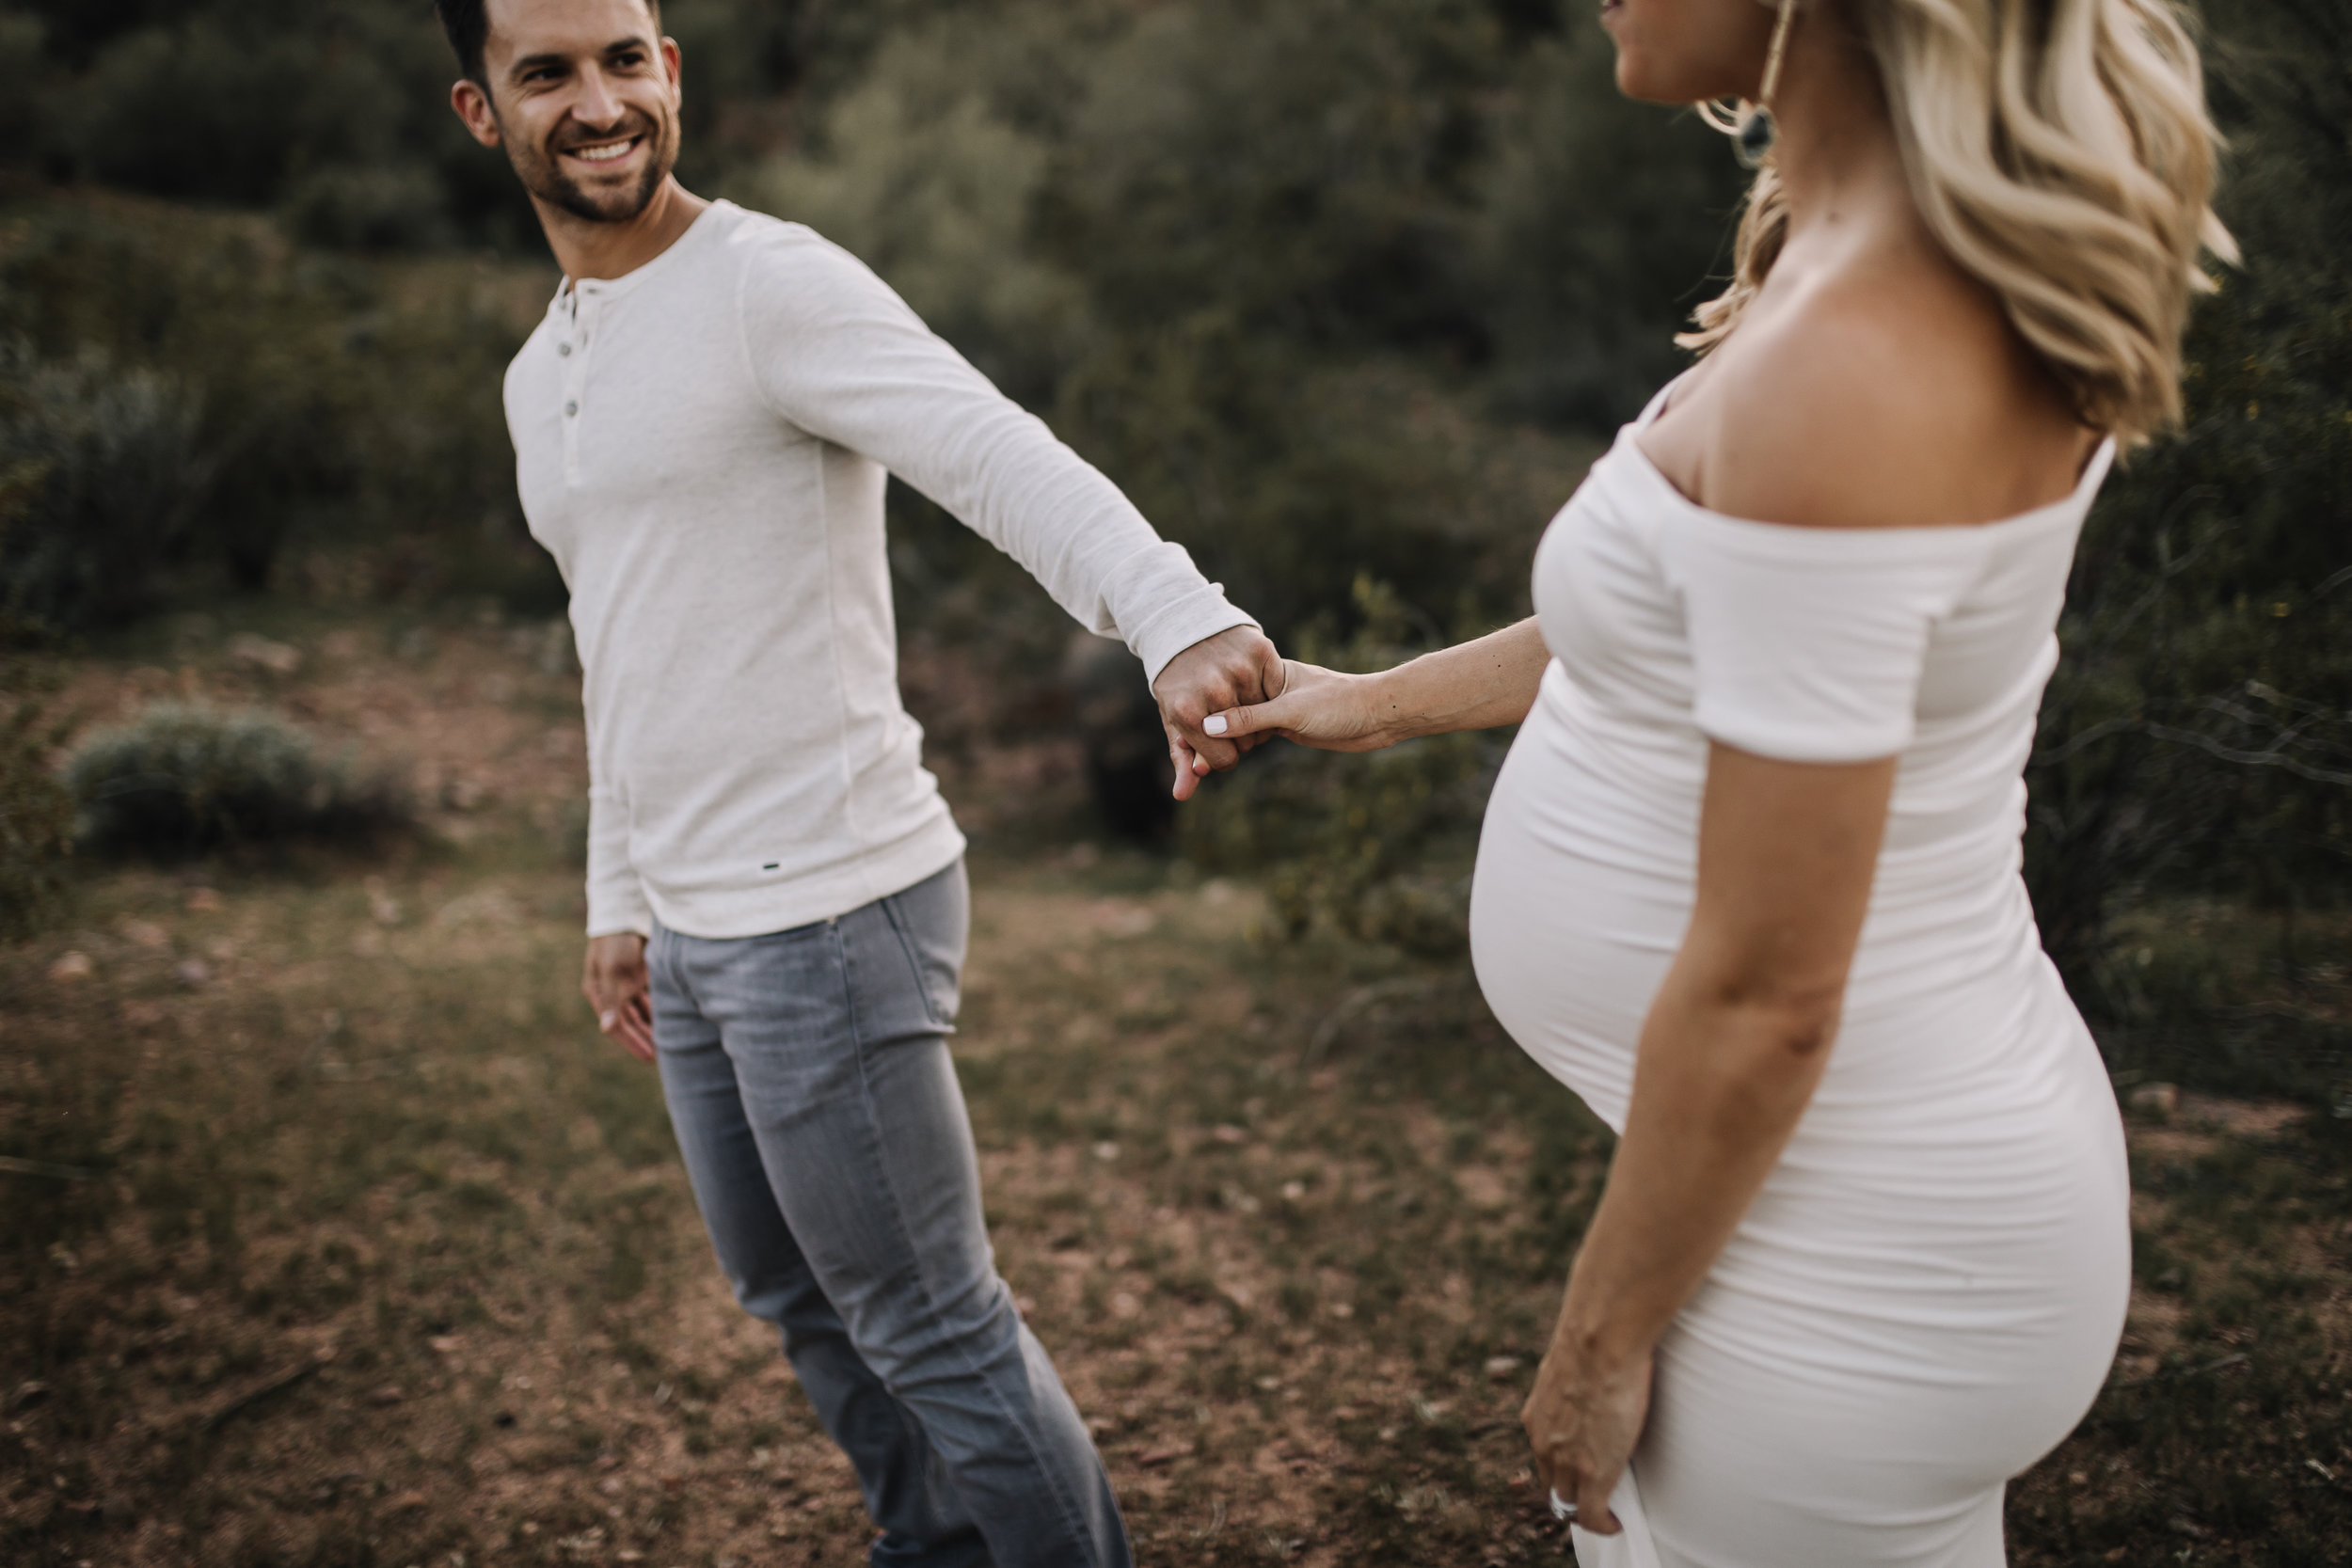 mintysnaps_maternitysession (8 of 16).jpg